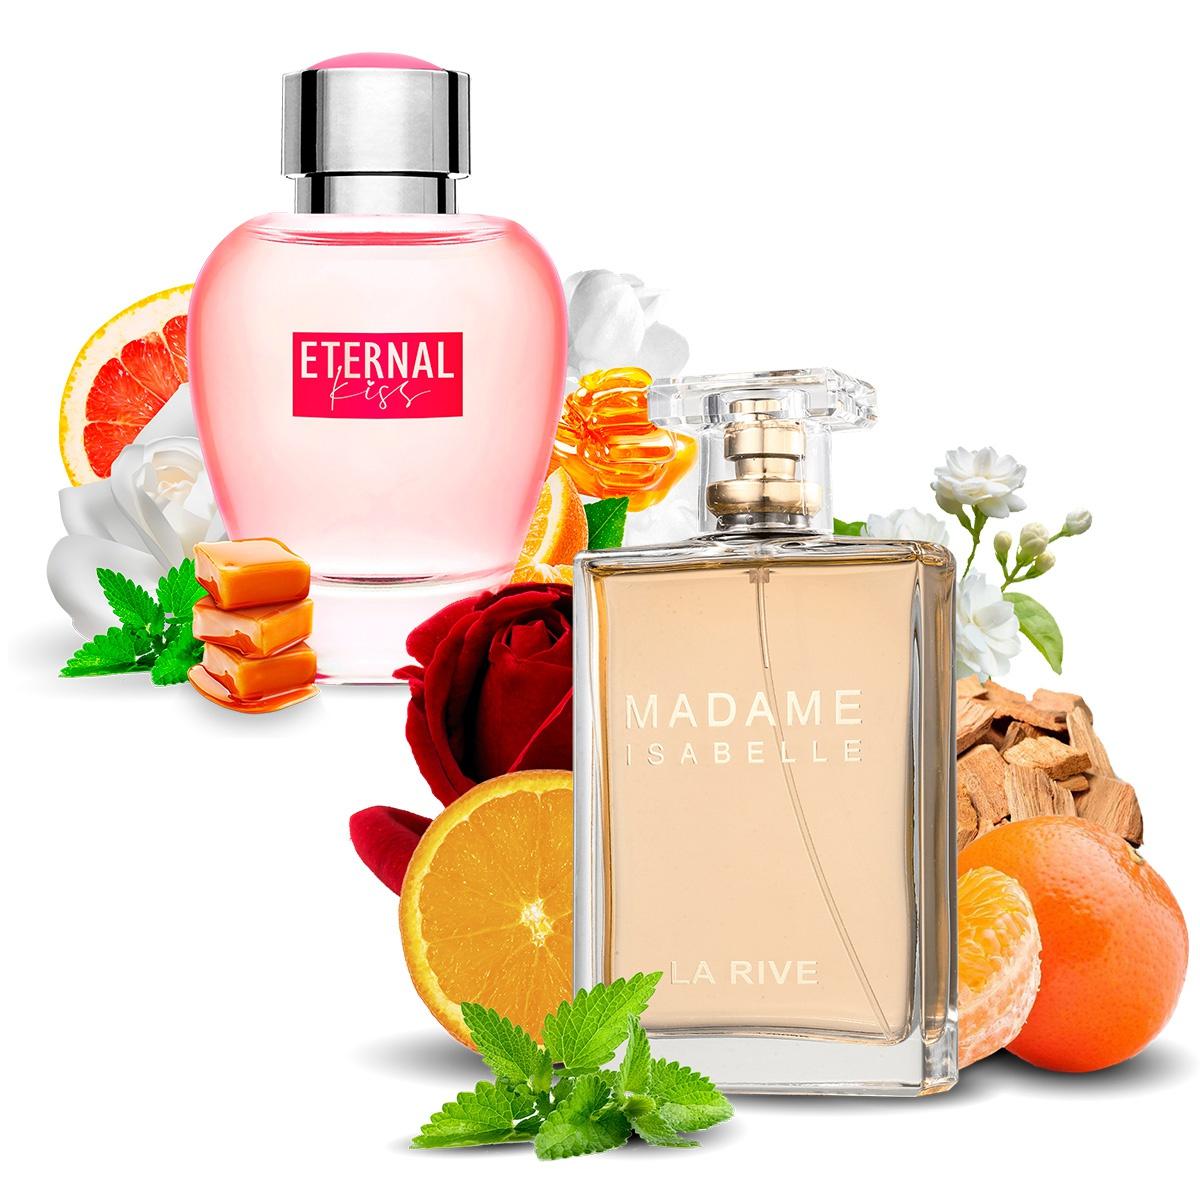 Kit 2 Perfumes, Madame Isabelle e Eternal Kiss La Rive